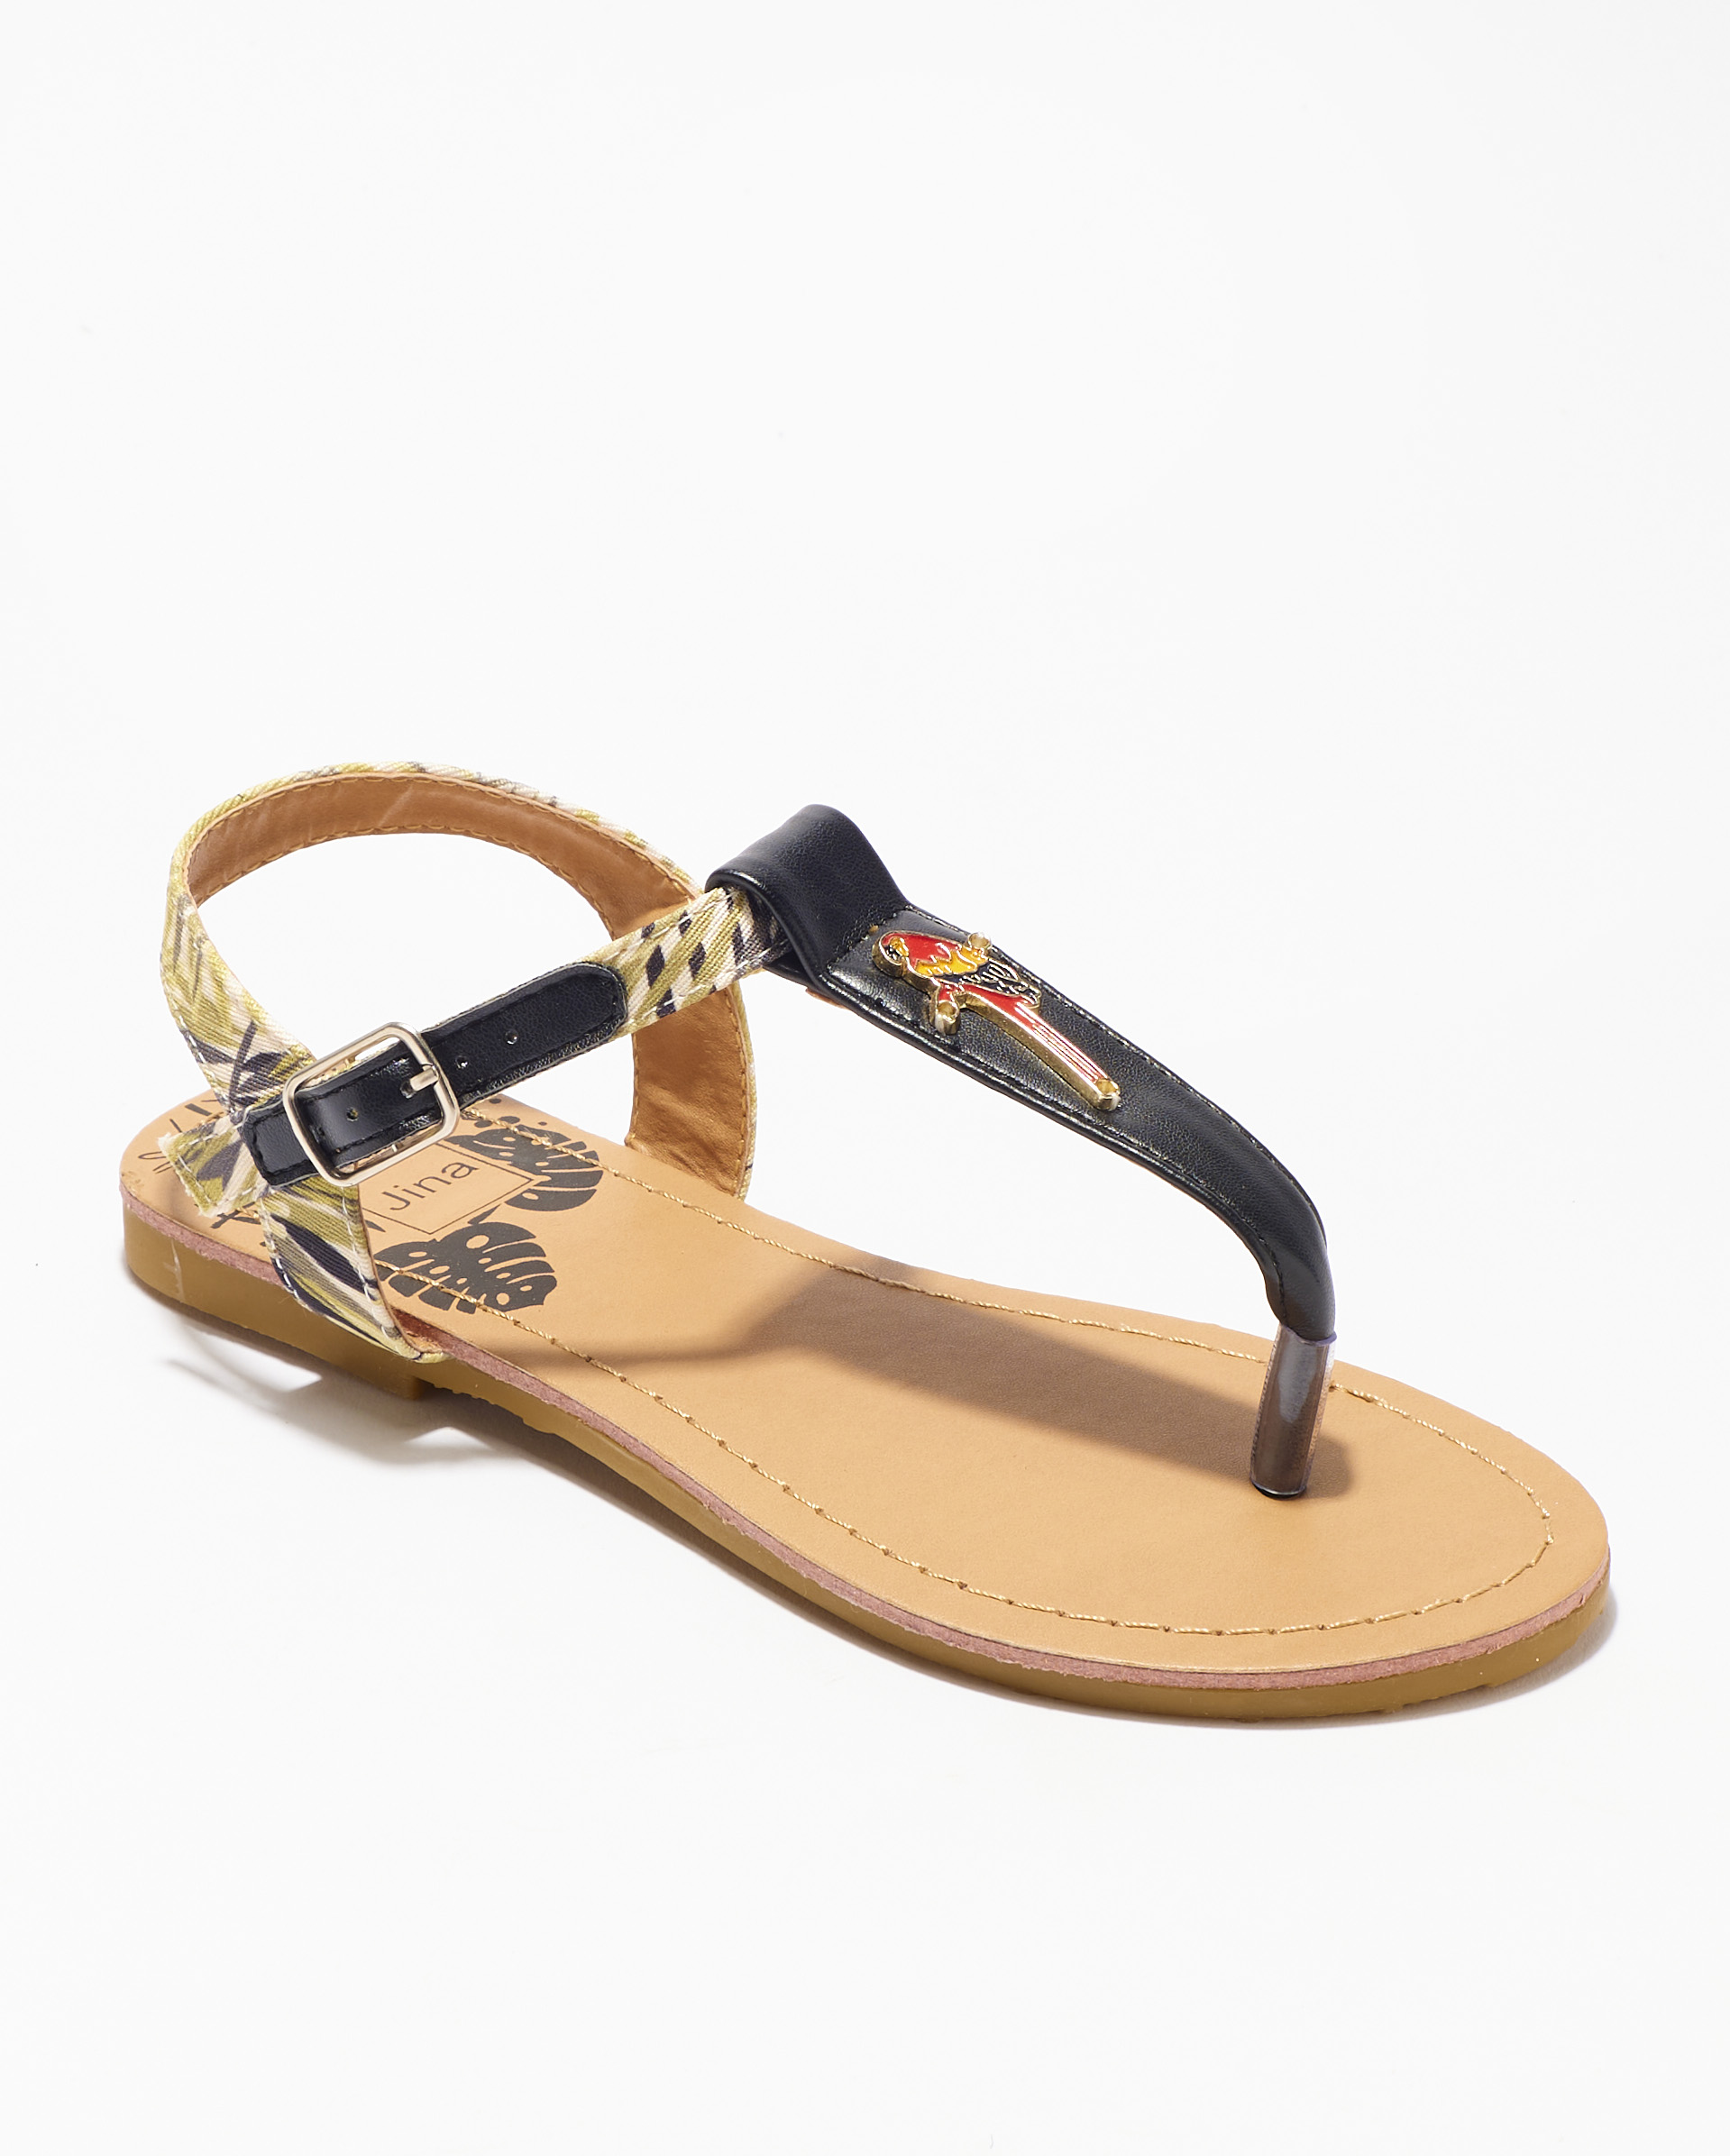 Sandales Fille - Sandale Ouverte Noir Jina - Ydx0212-Jn Jf